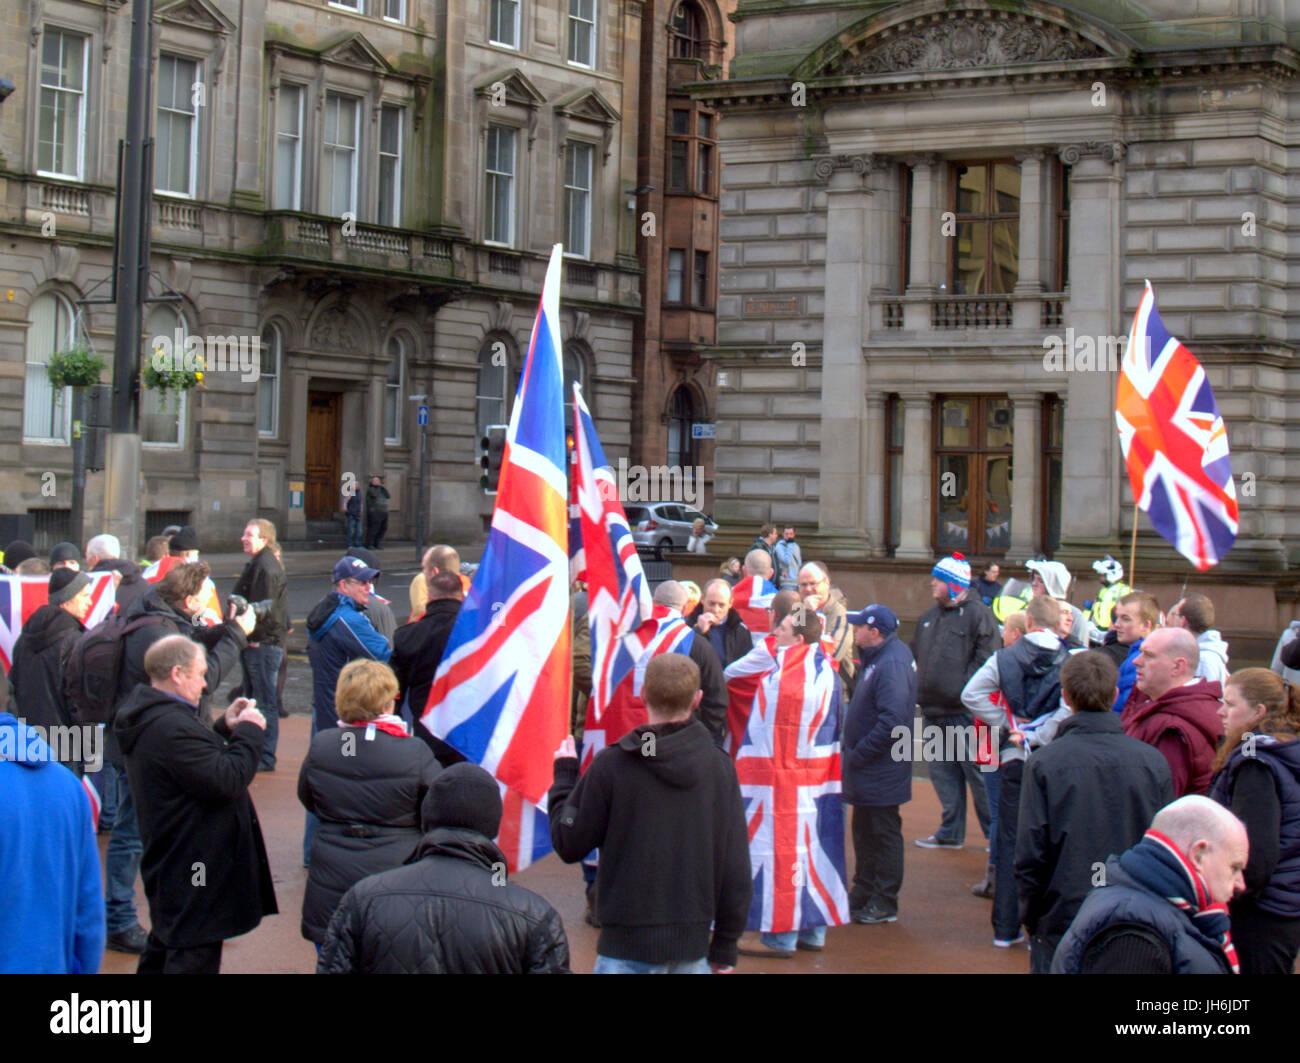 protestant loyalist unionist Rangers football club rally George Square Glasgow Scotland union jack flags keeks - Stock Image